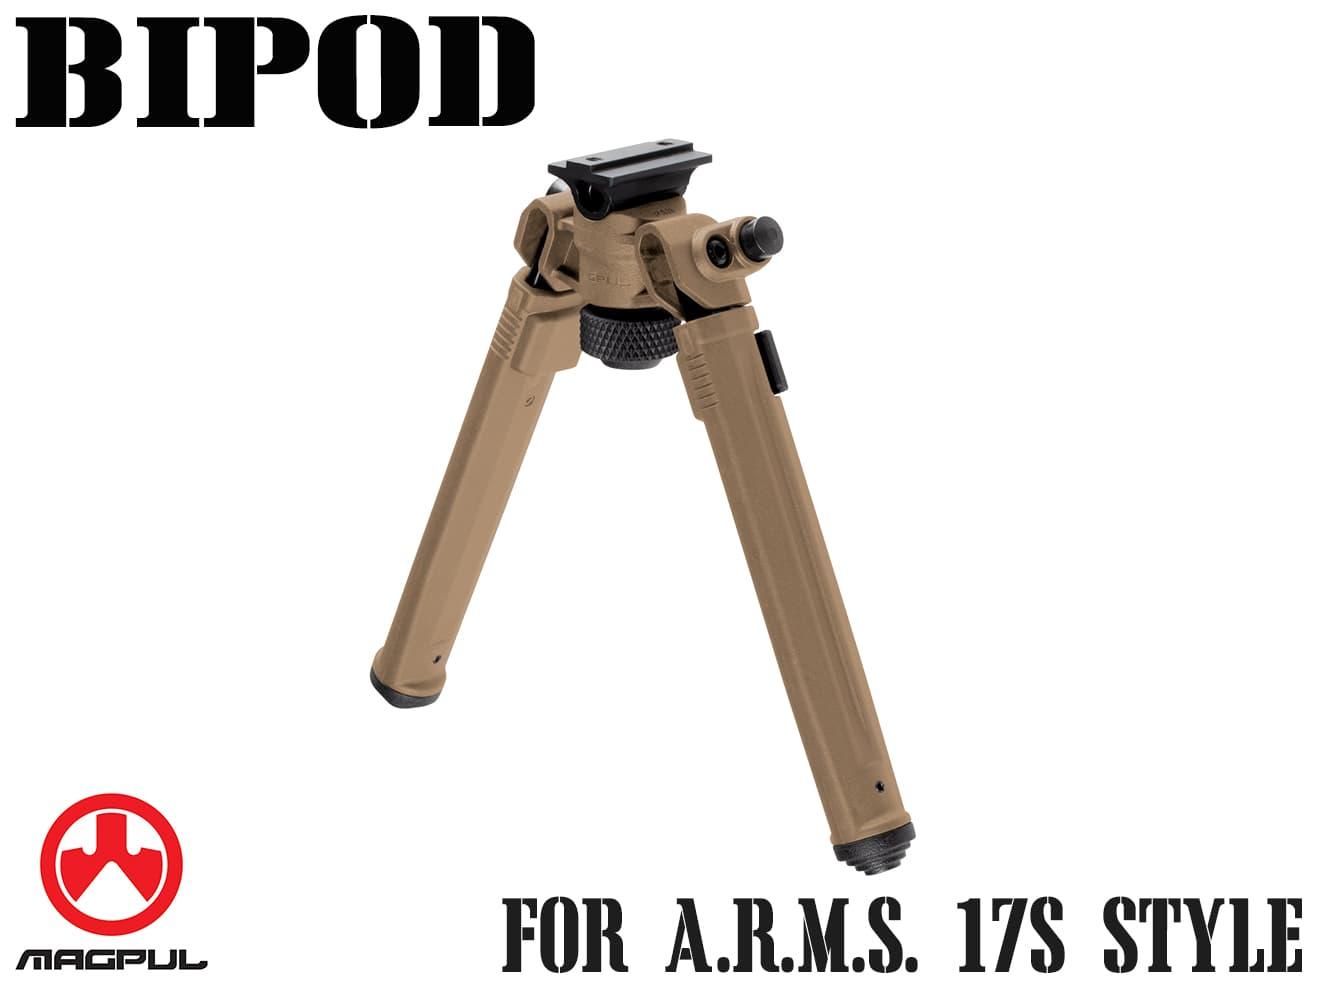 Magpul バイポッド for A.R.M.S. 17S Style◆FDE マグプル正規品 A.R.M.S. 17S スタイル レールアダプター対応 7段階調整 丈夫 MA556490313